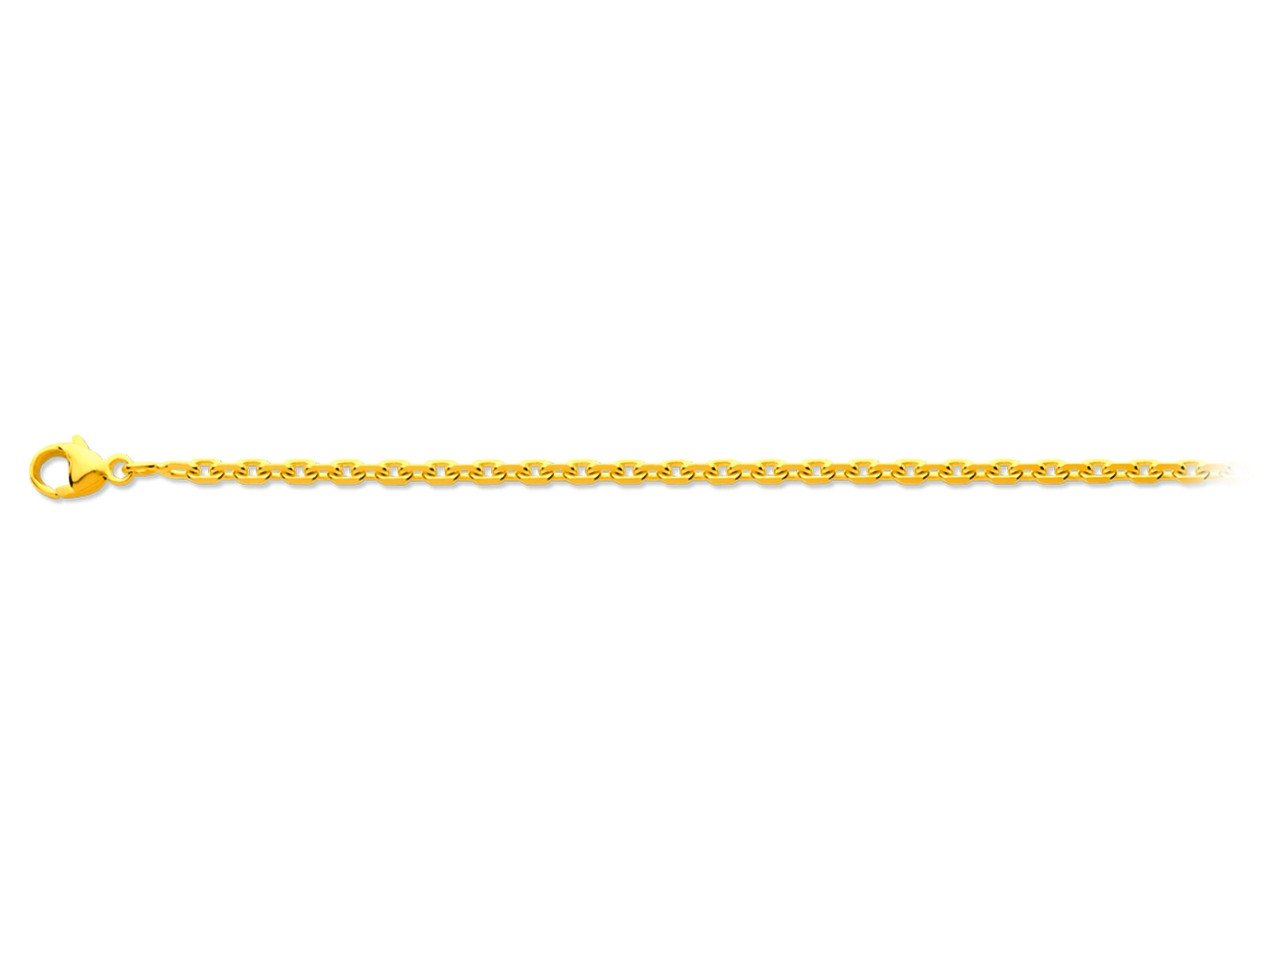 Chaîne maille forçat en or jaune - 60 cm